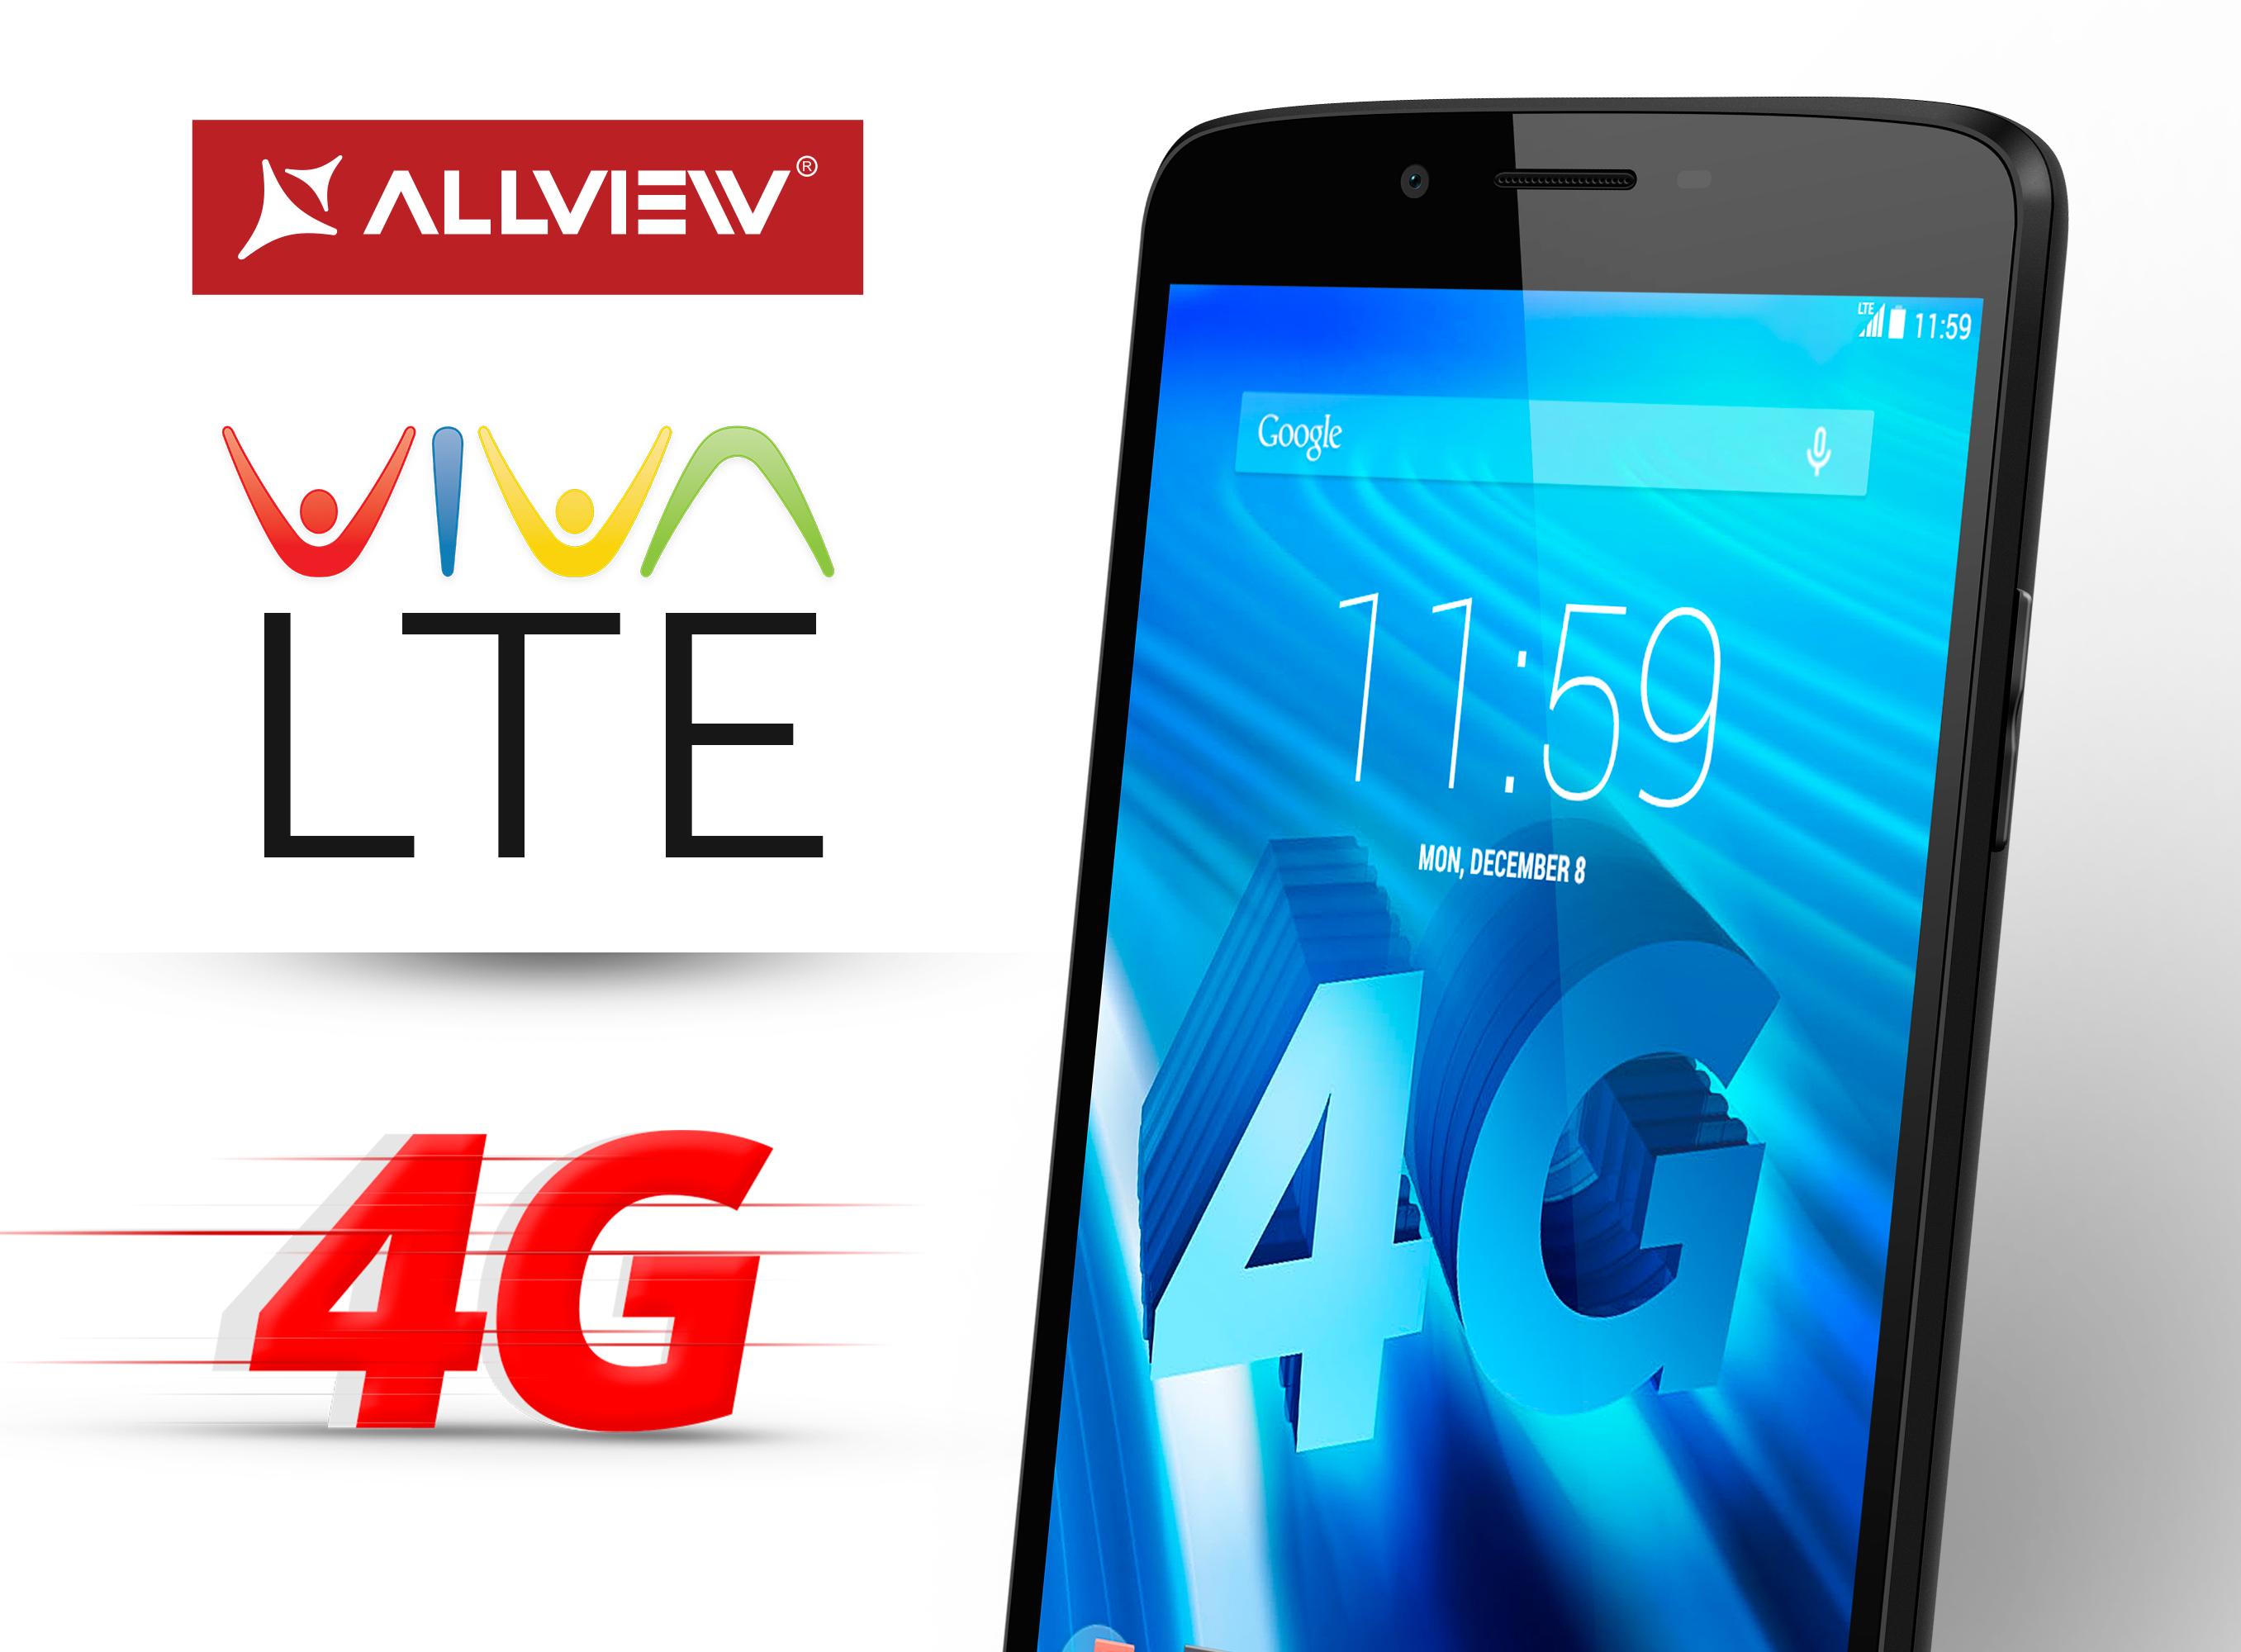 Allview VIVA LTE